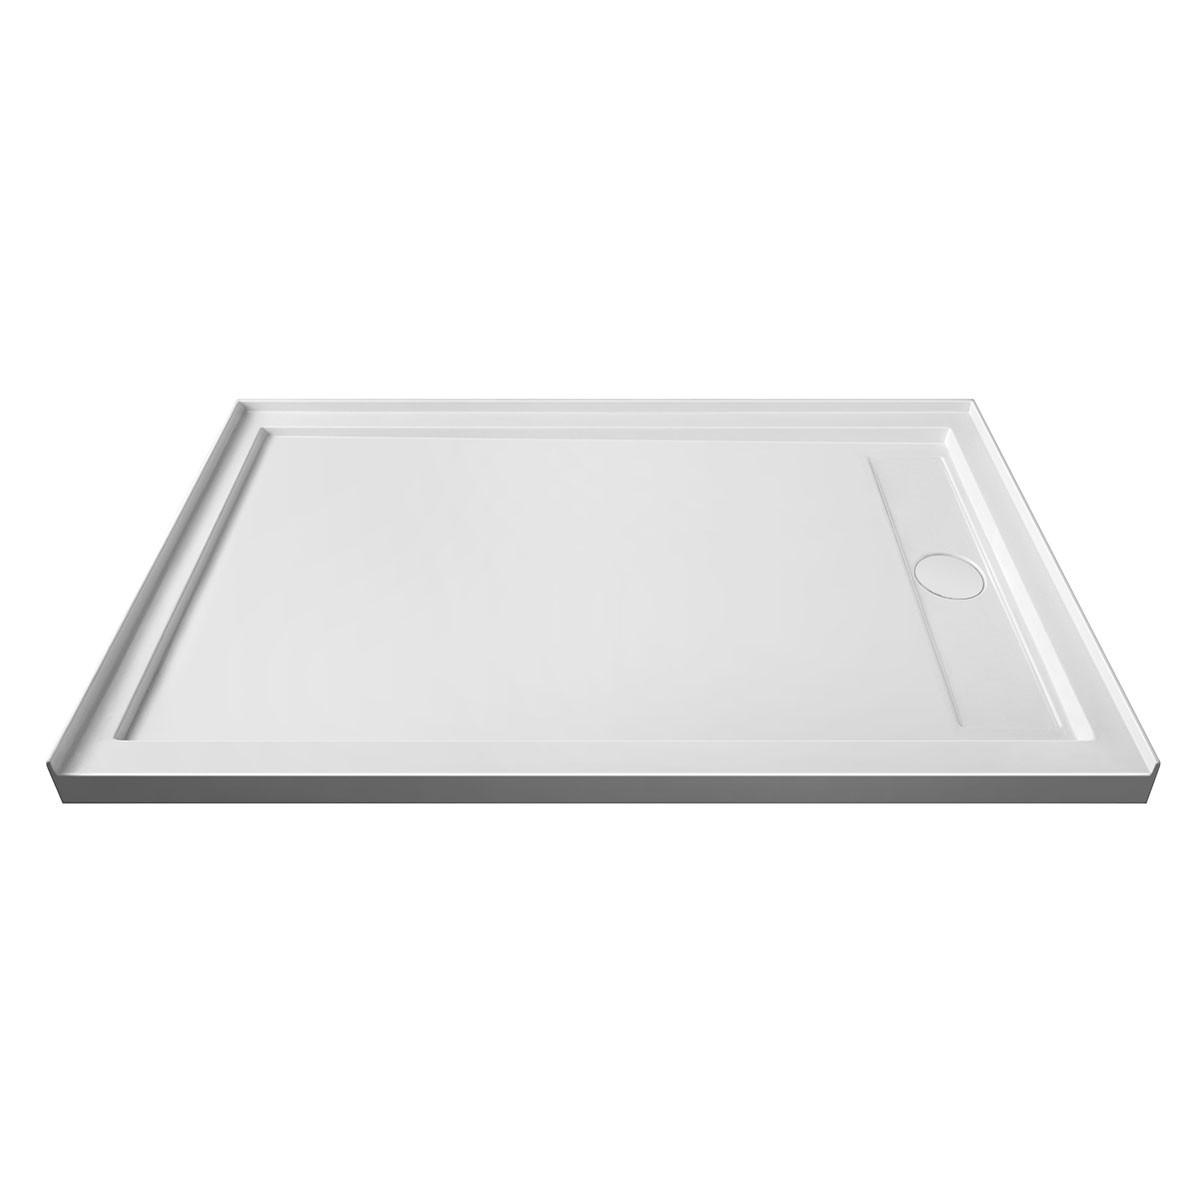 "Base de douche rectangulaire 60"" x 36"" (DK-STA-18005)"